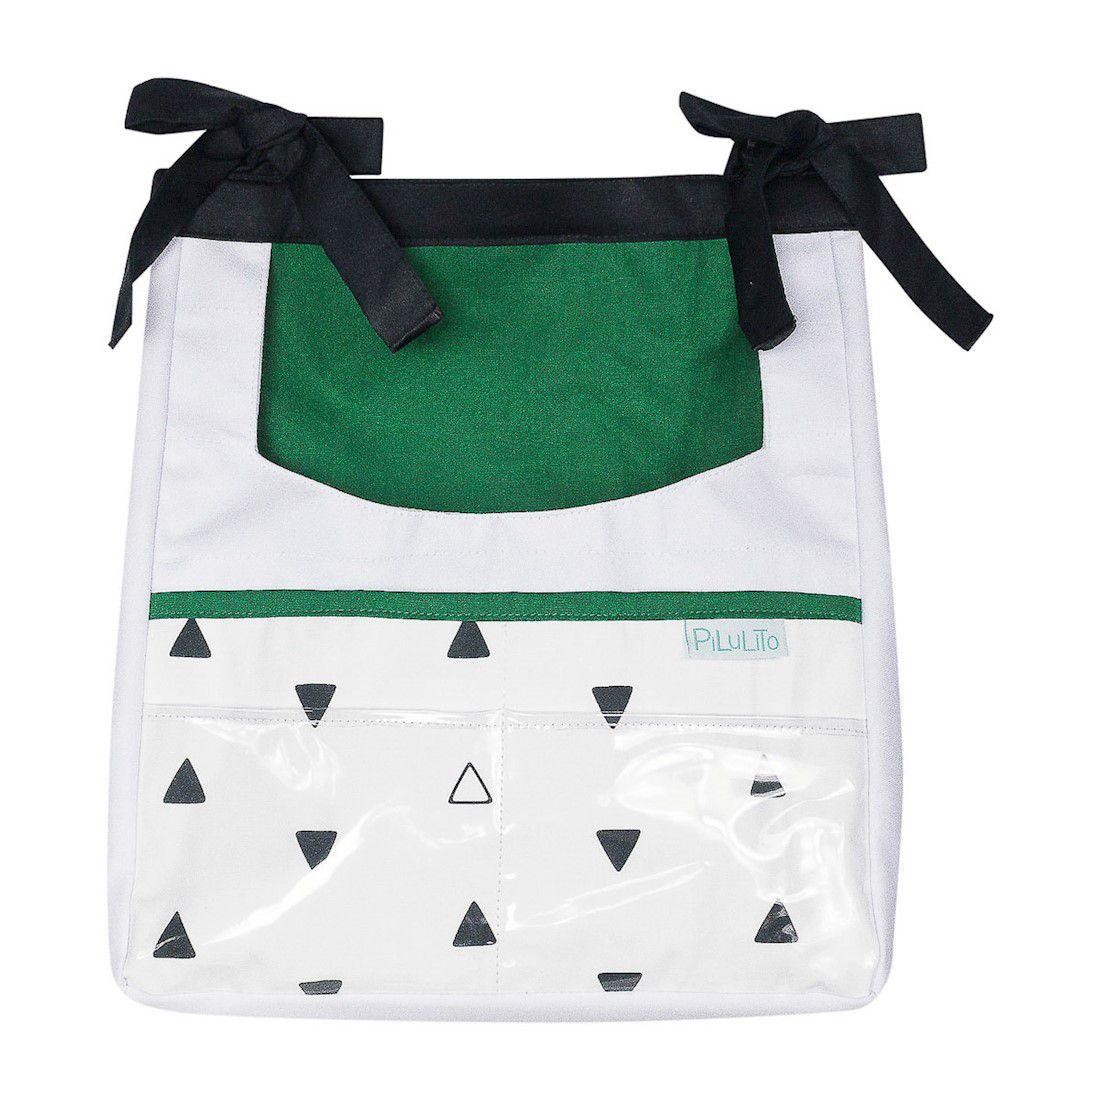 Porta-trecos triângulos PB com verde malaquita